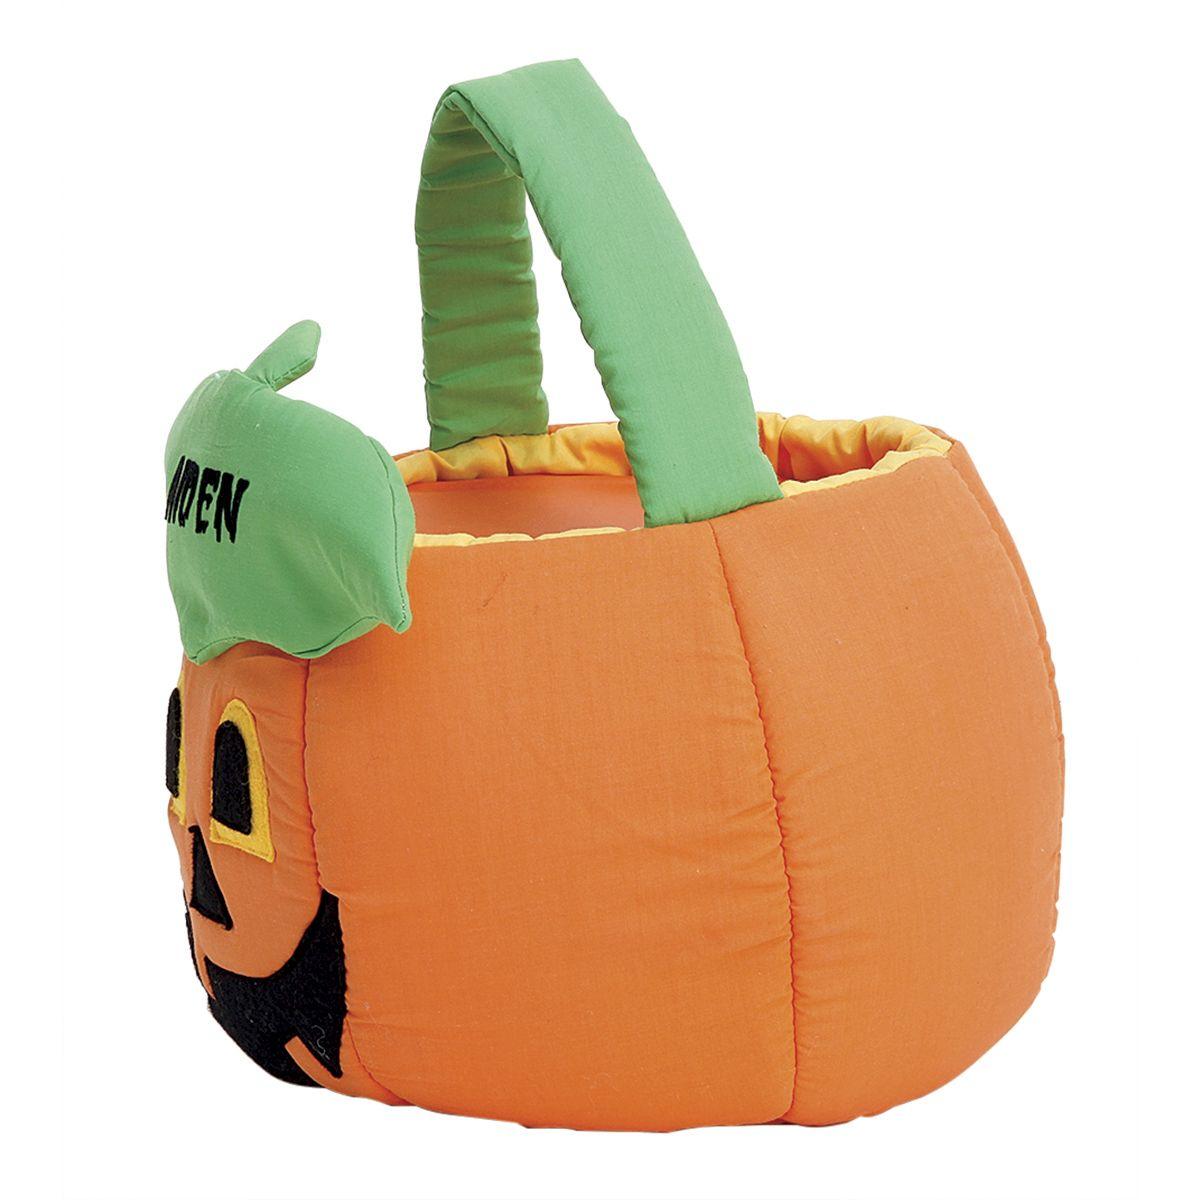 Jack-o'-Lantern Personalized Halloween Treat Basket